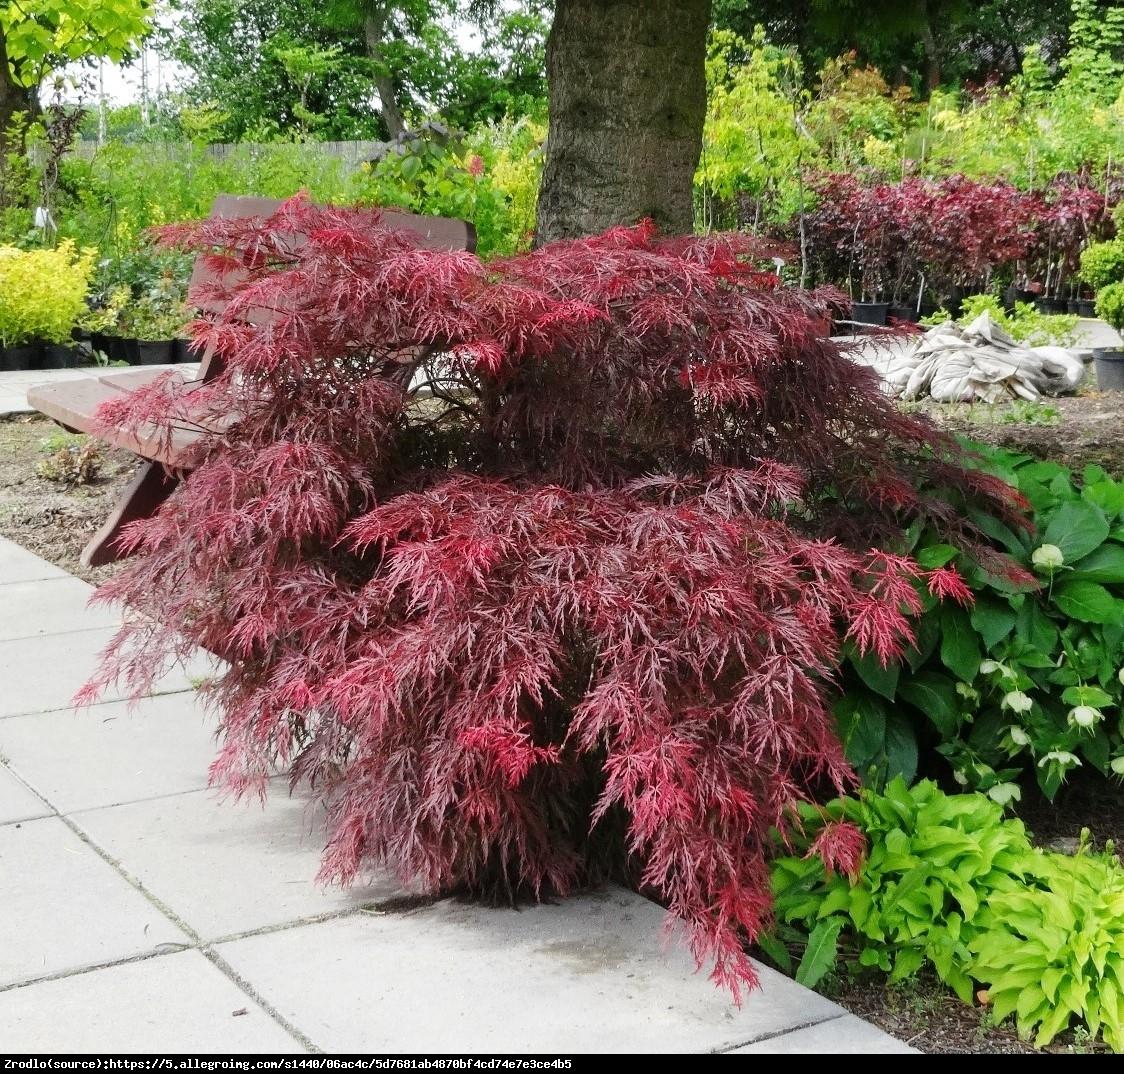 Klon palmowy Garnet - Acer palmatum Garnet